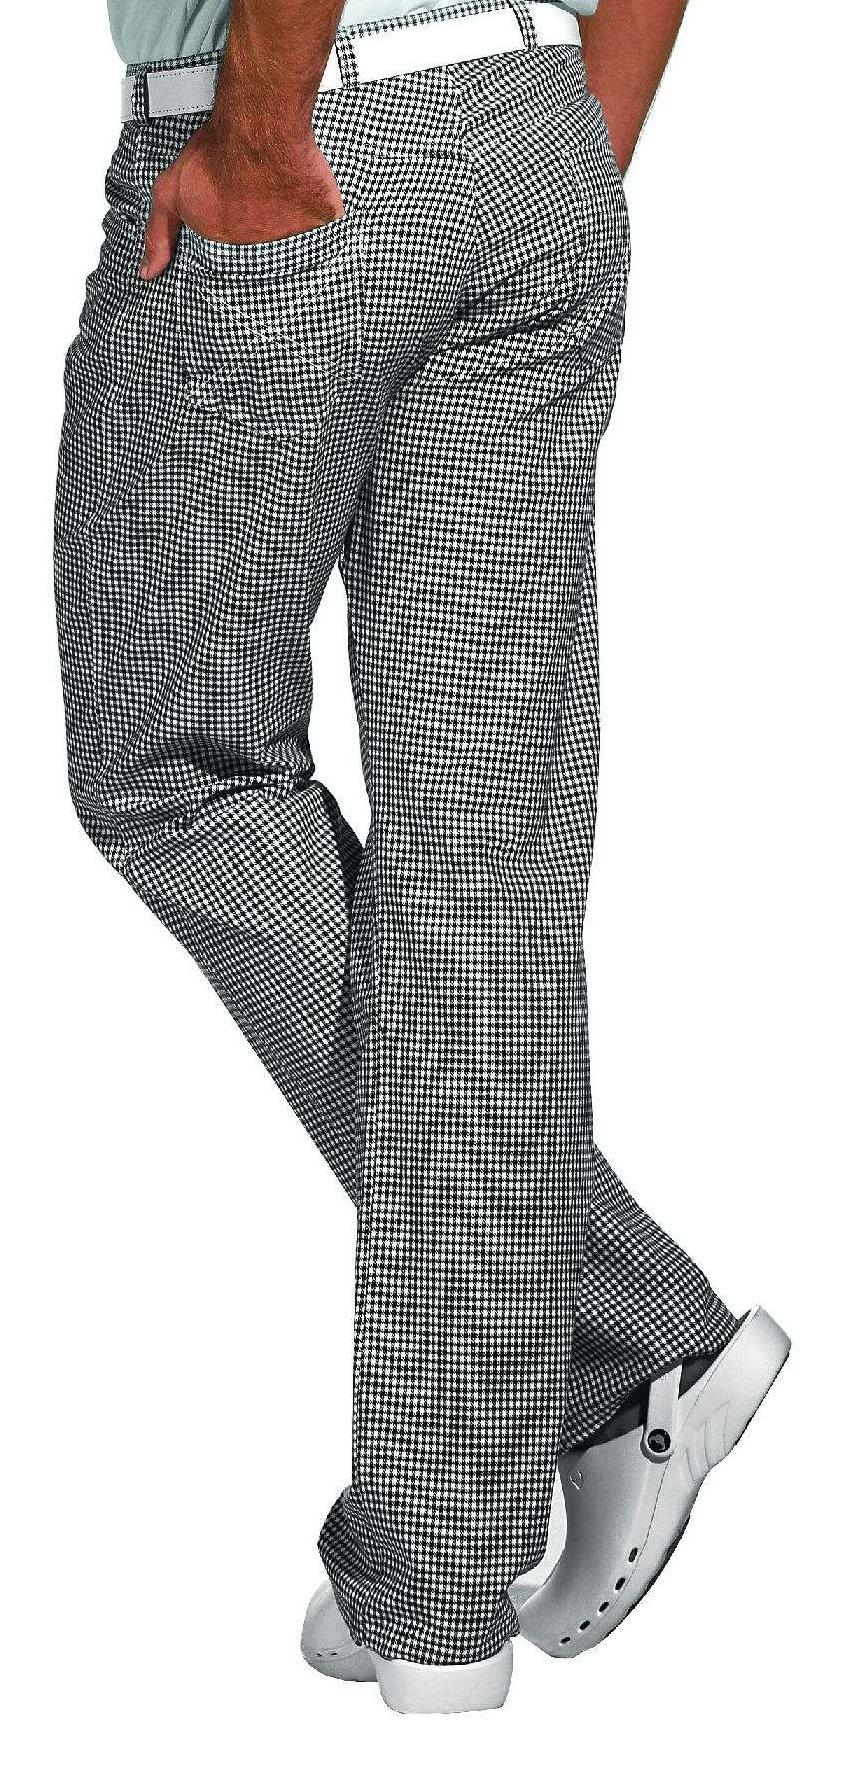 Leiber L12/1380 Damen- und Herren Jeans Kochhose 100% Bw